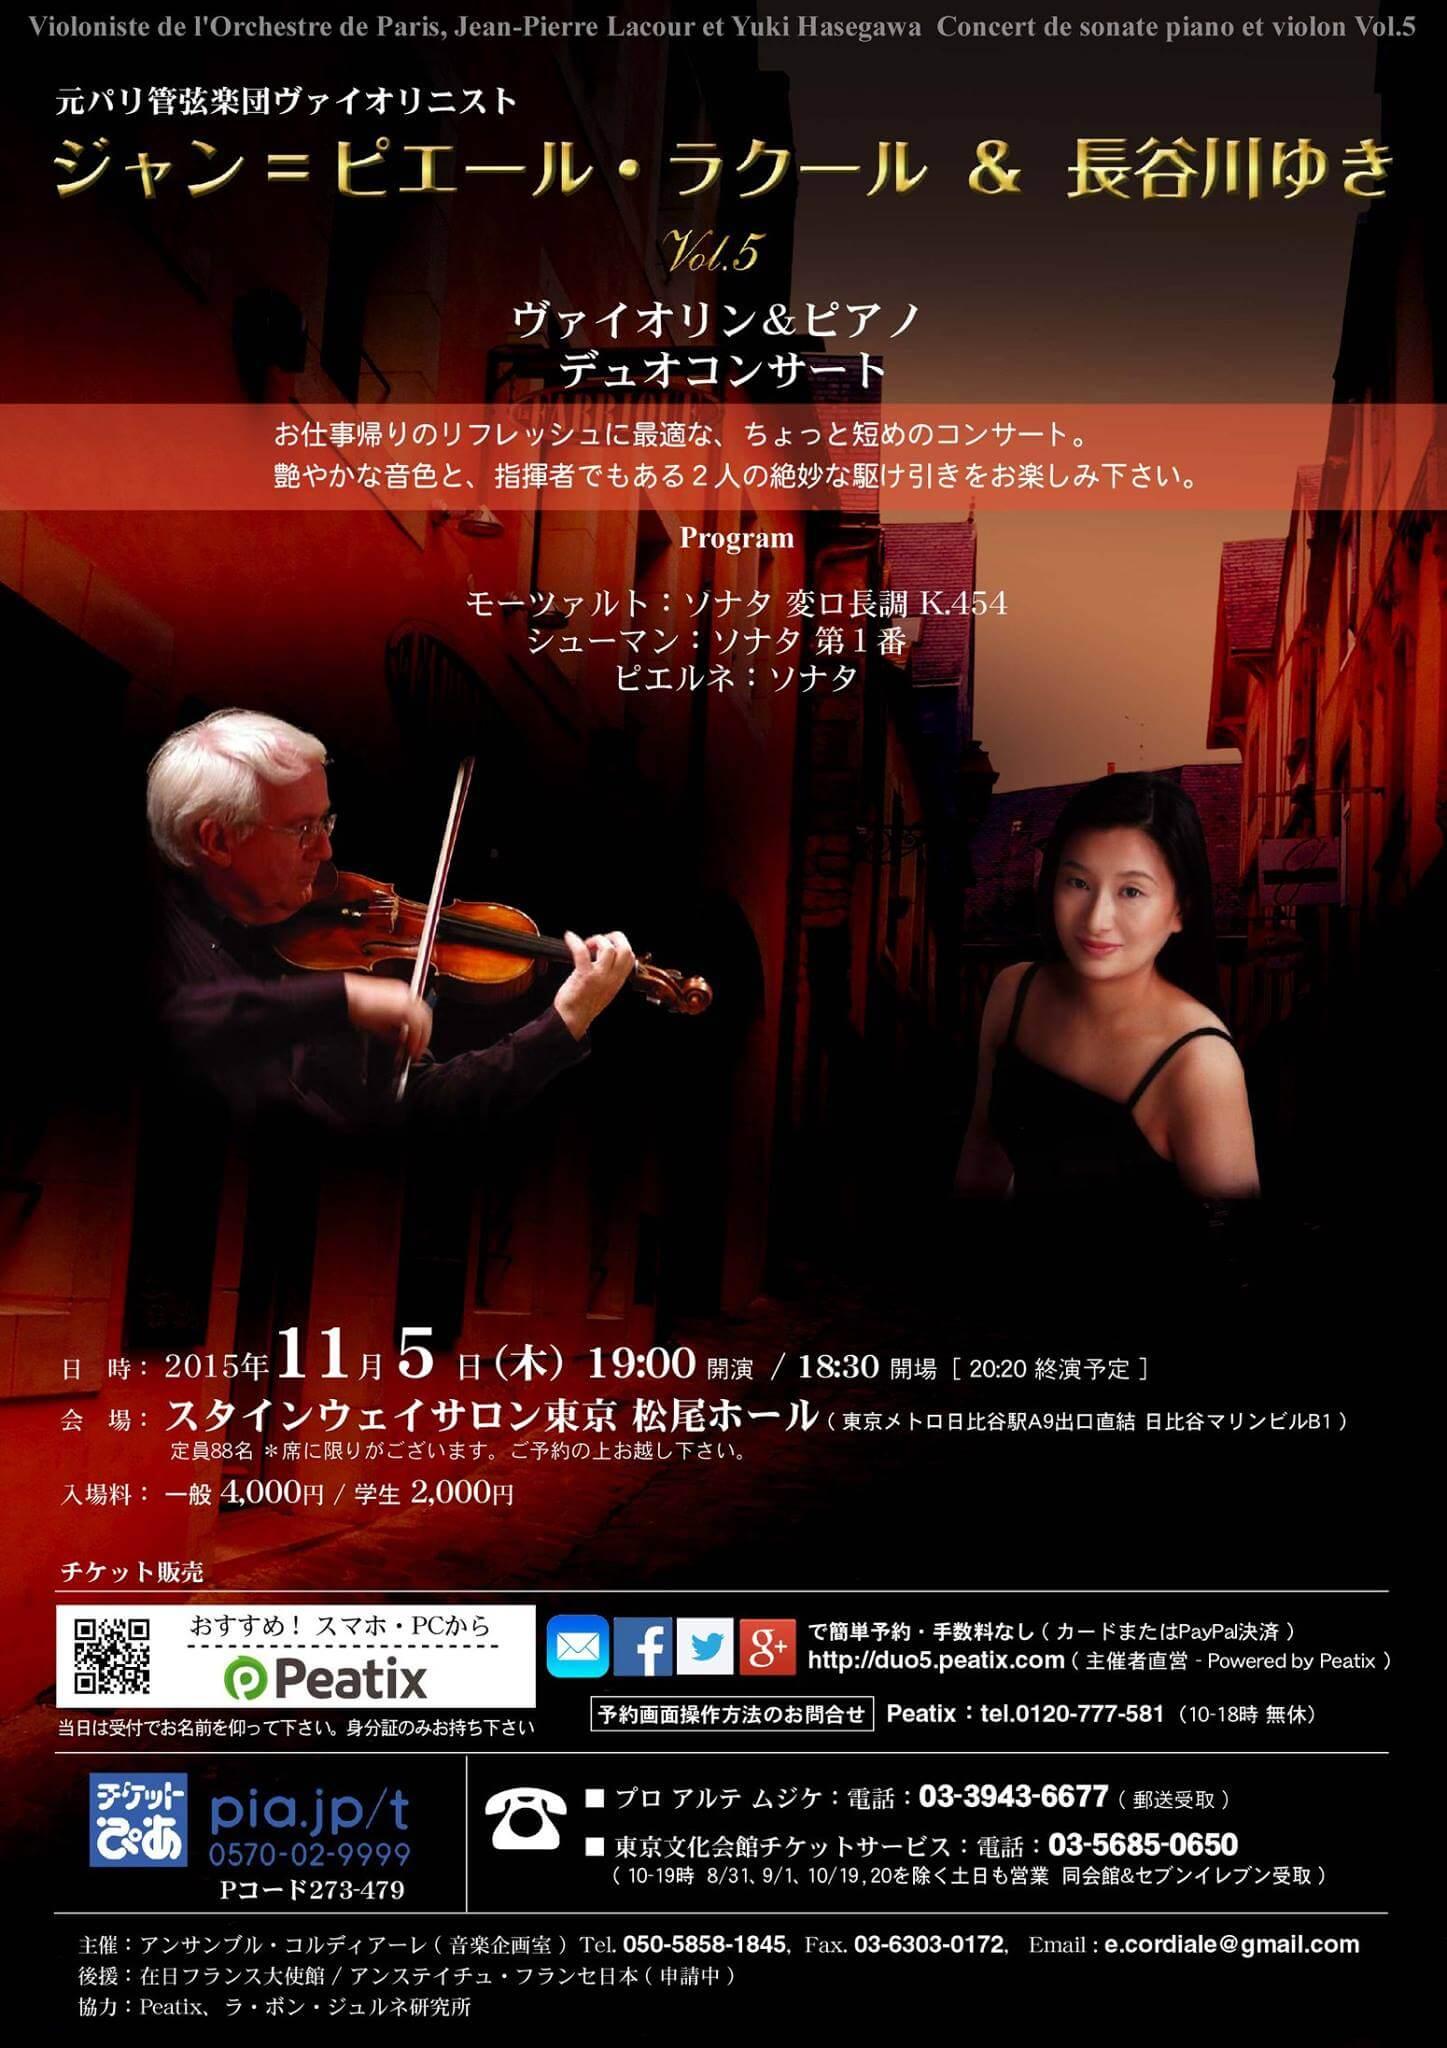 Former Paris Orchestra Violin Jean-Pierre Lacourt / Yuki Hasegawa